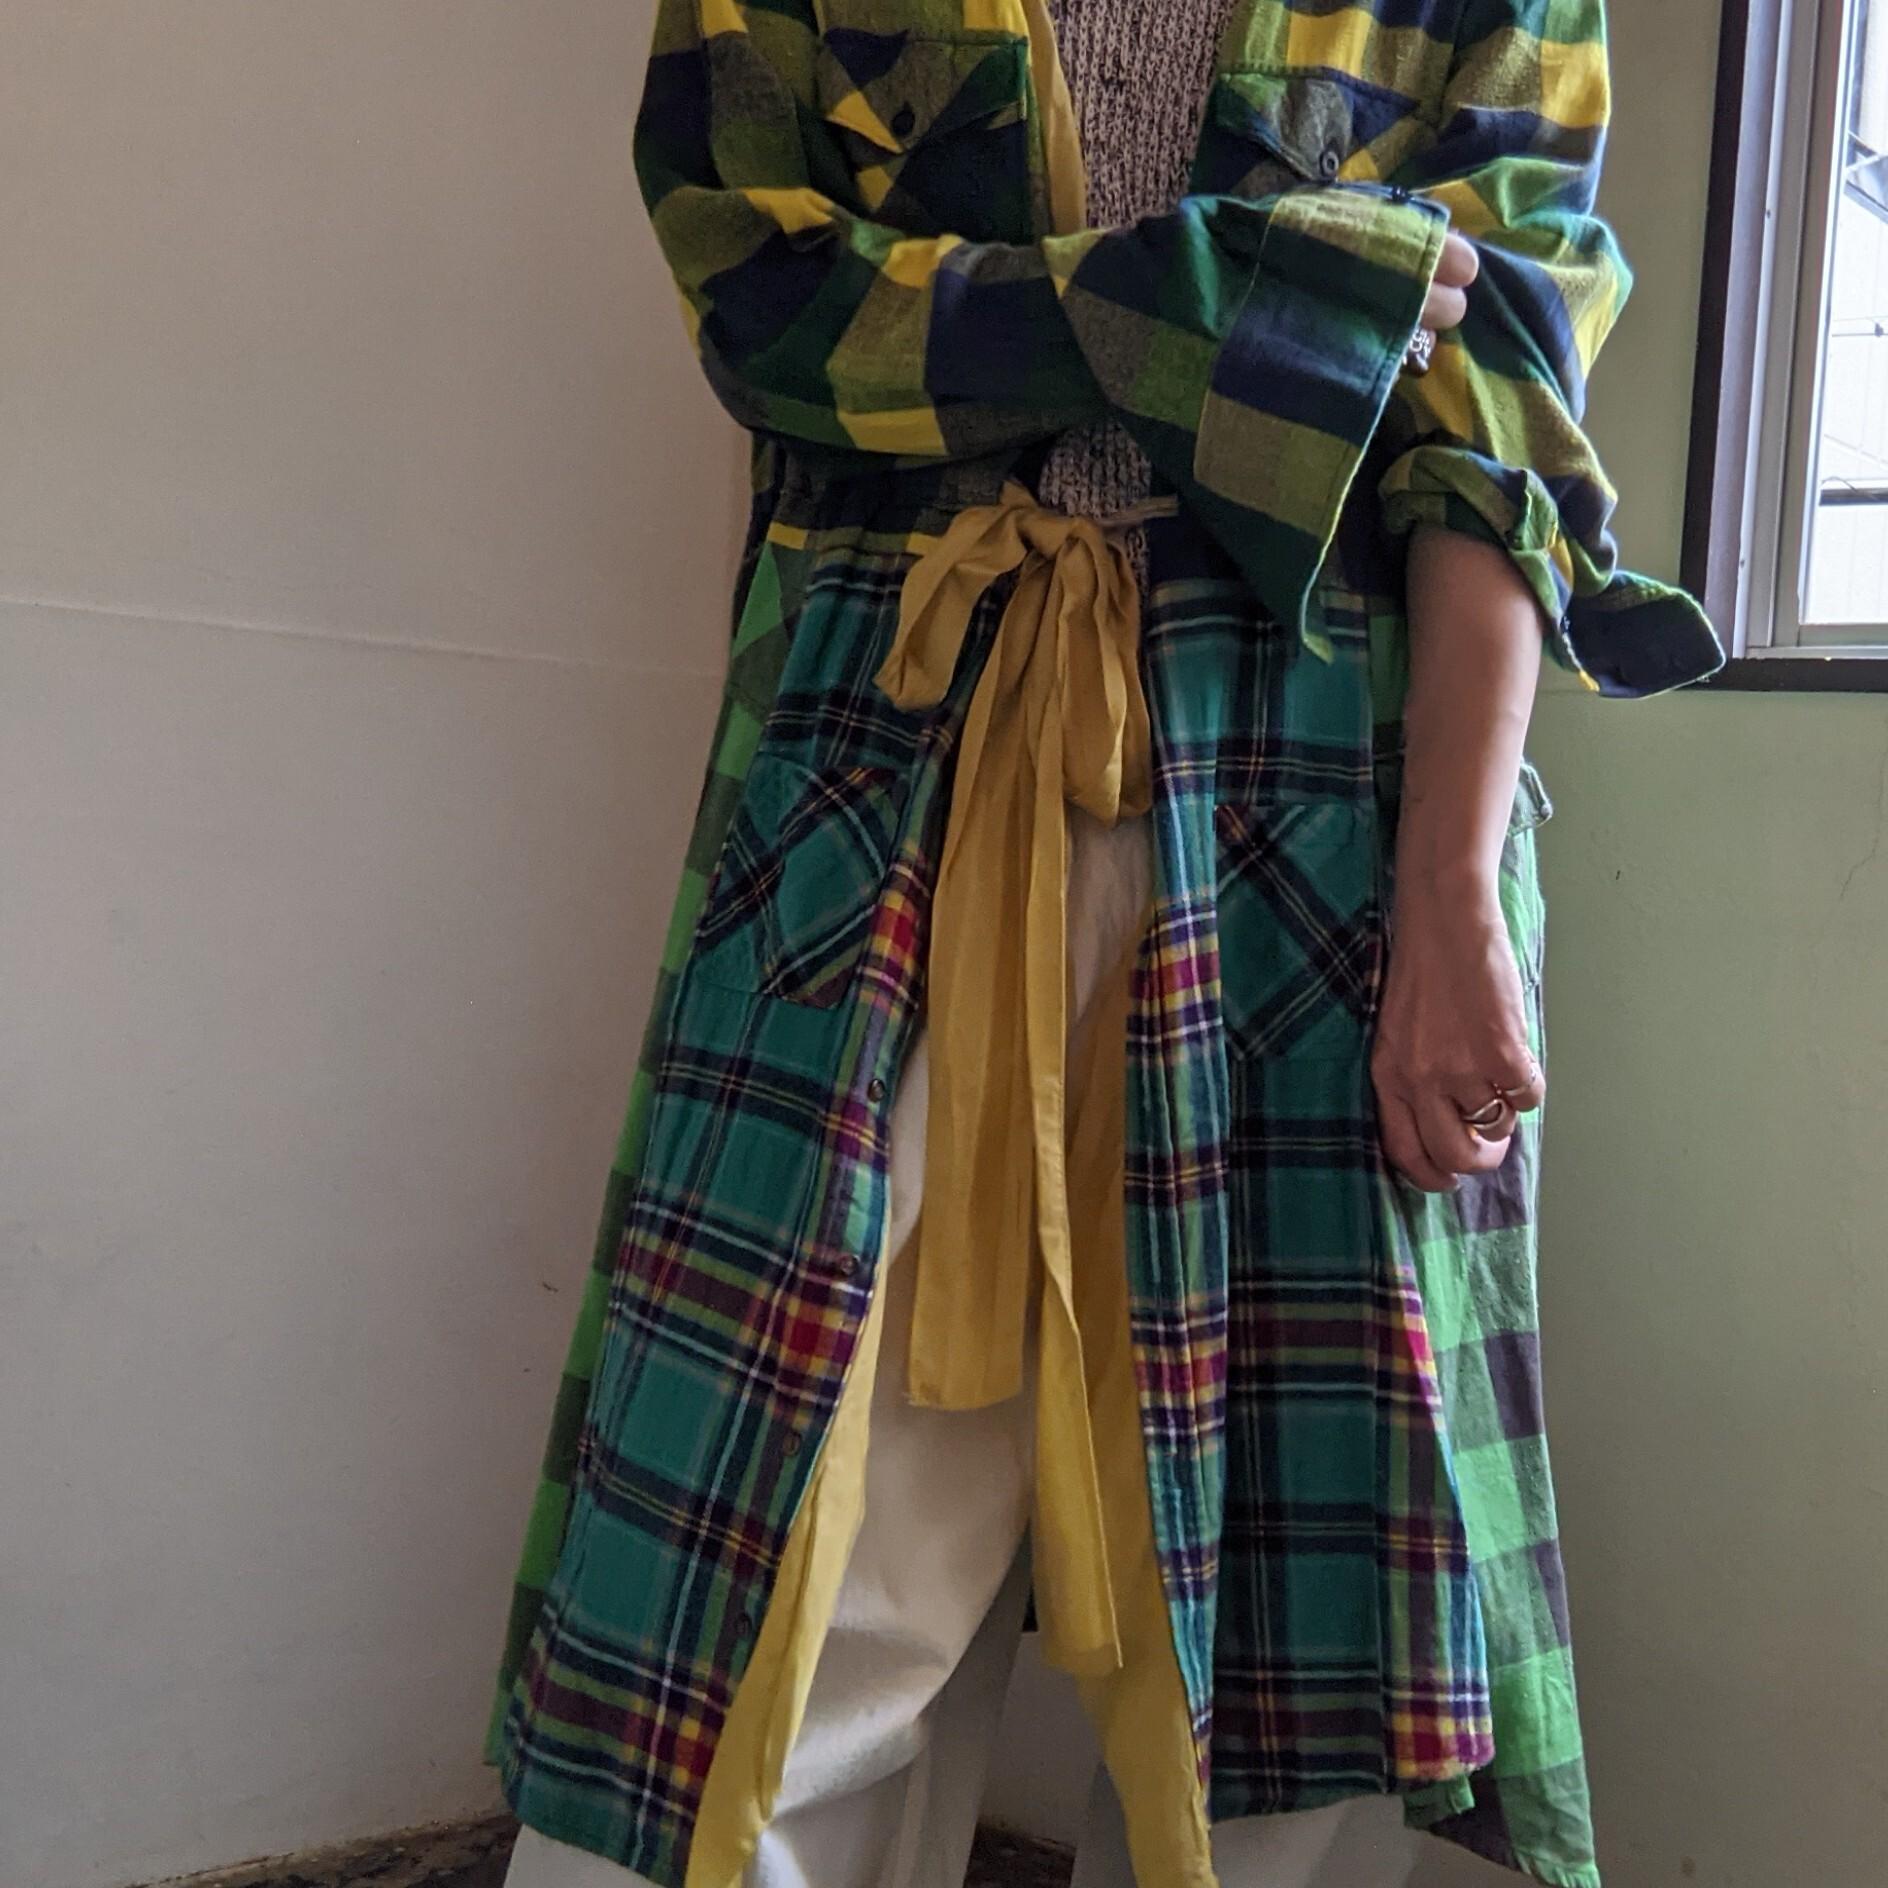 【 REHERSALL 】リハーズオール / リメイク / ネルシャツガウン / remake flannel shirt gown / yellow mix